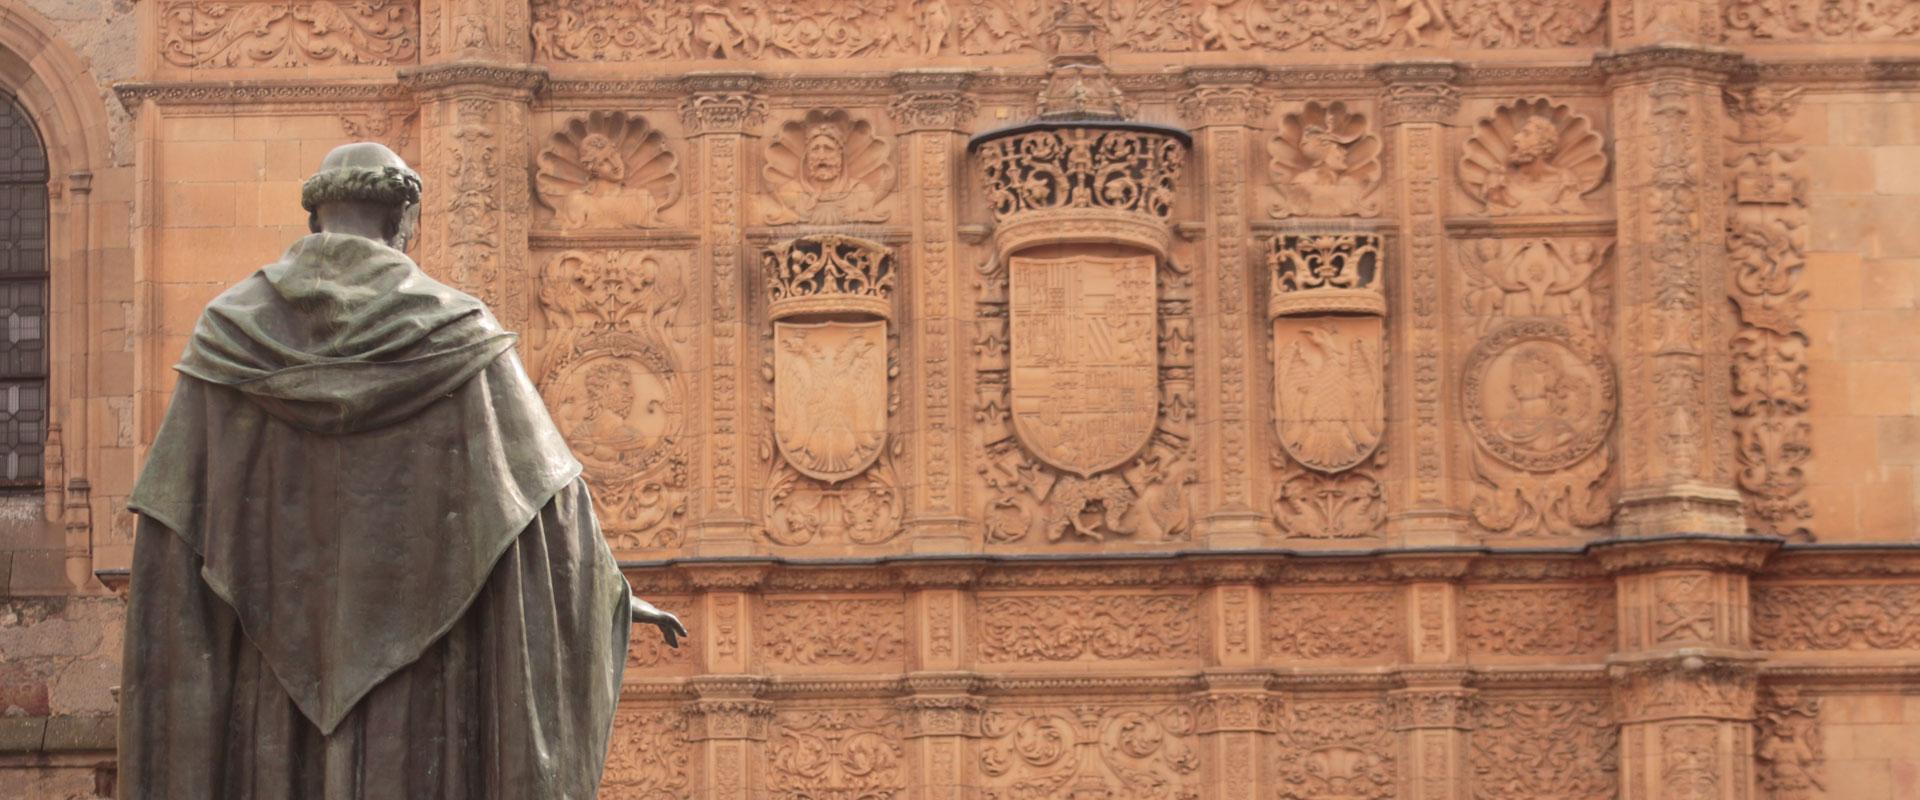 Tour Privado Salamanca - Madrid Experience - (00 34) 915 417 099 - info@madrid-experience.com